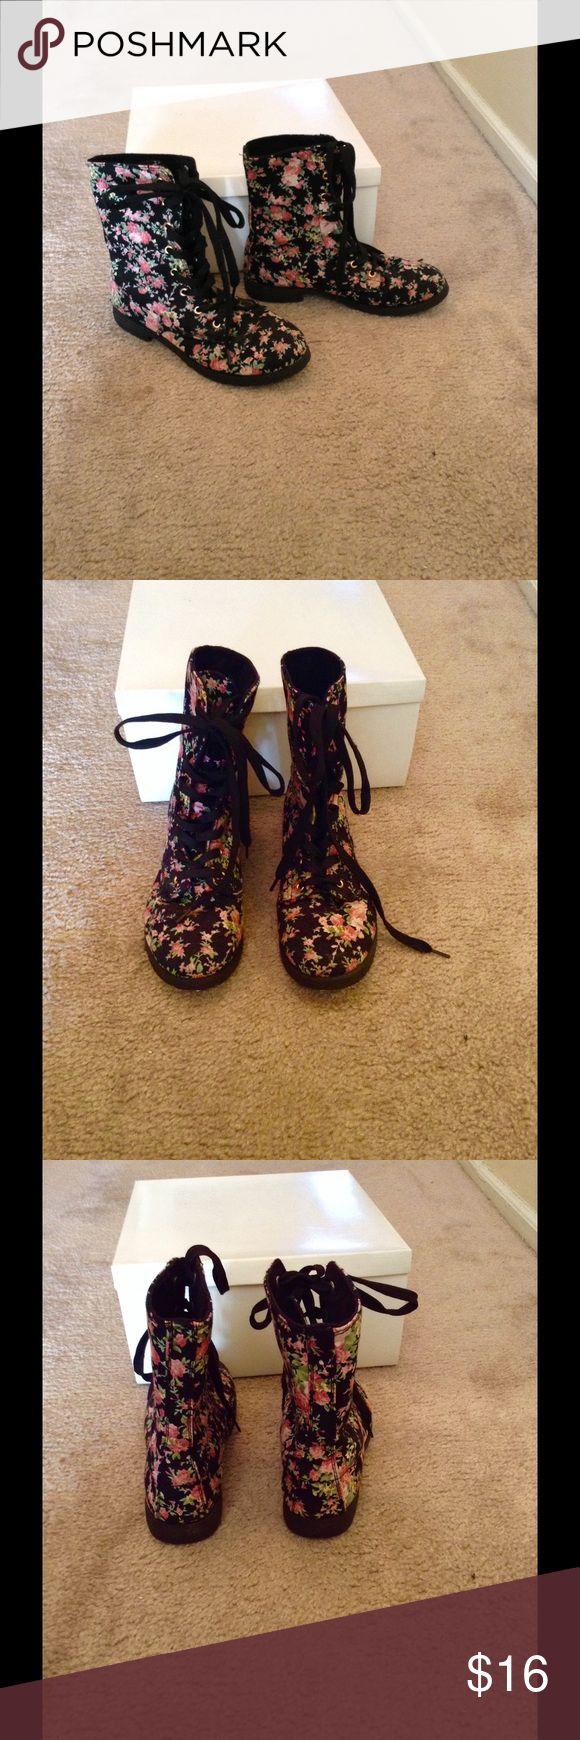 Floral combat boots Pretty floral design, pink / black/green , black lace up combat boots. Size 6 . A re-posh, not my style. Not sure how t wear them E.T.C. Shoes Combat & Moto Boots